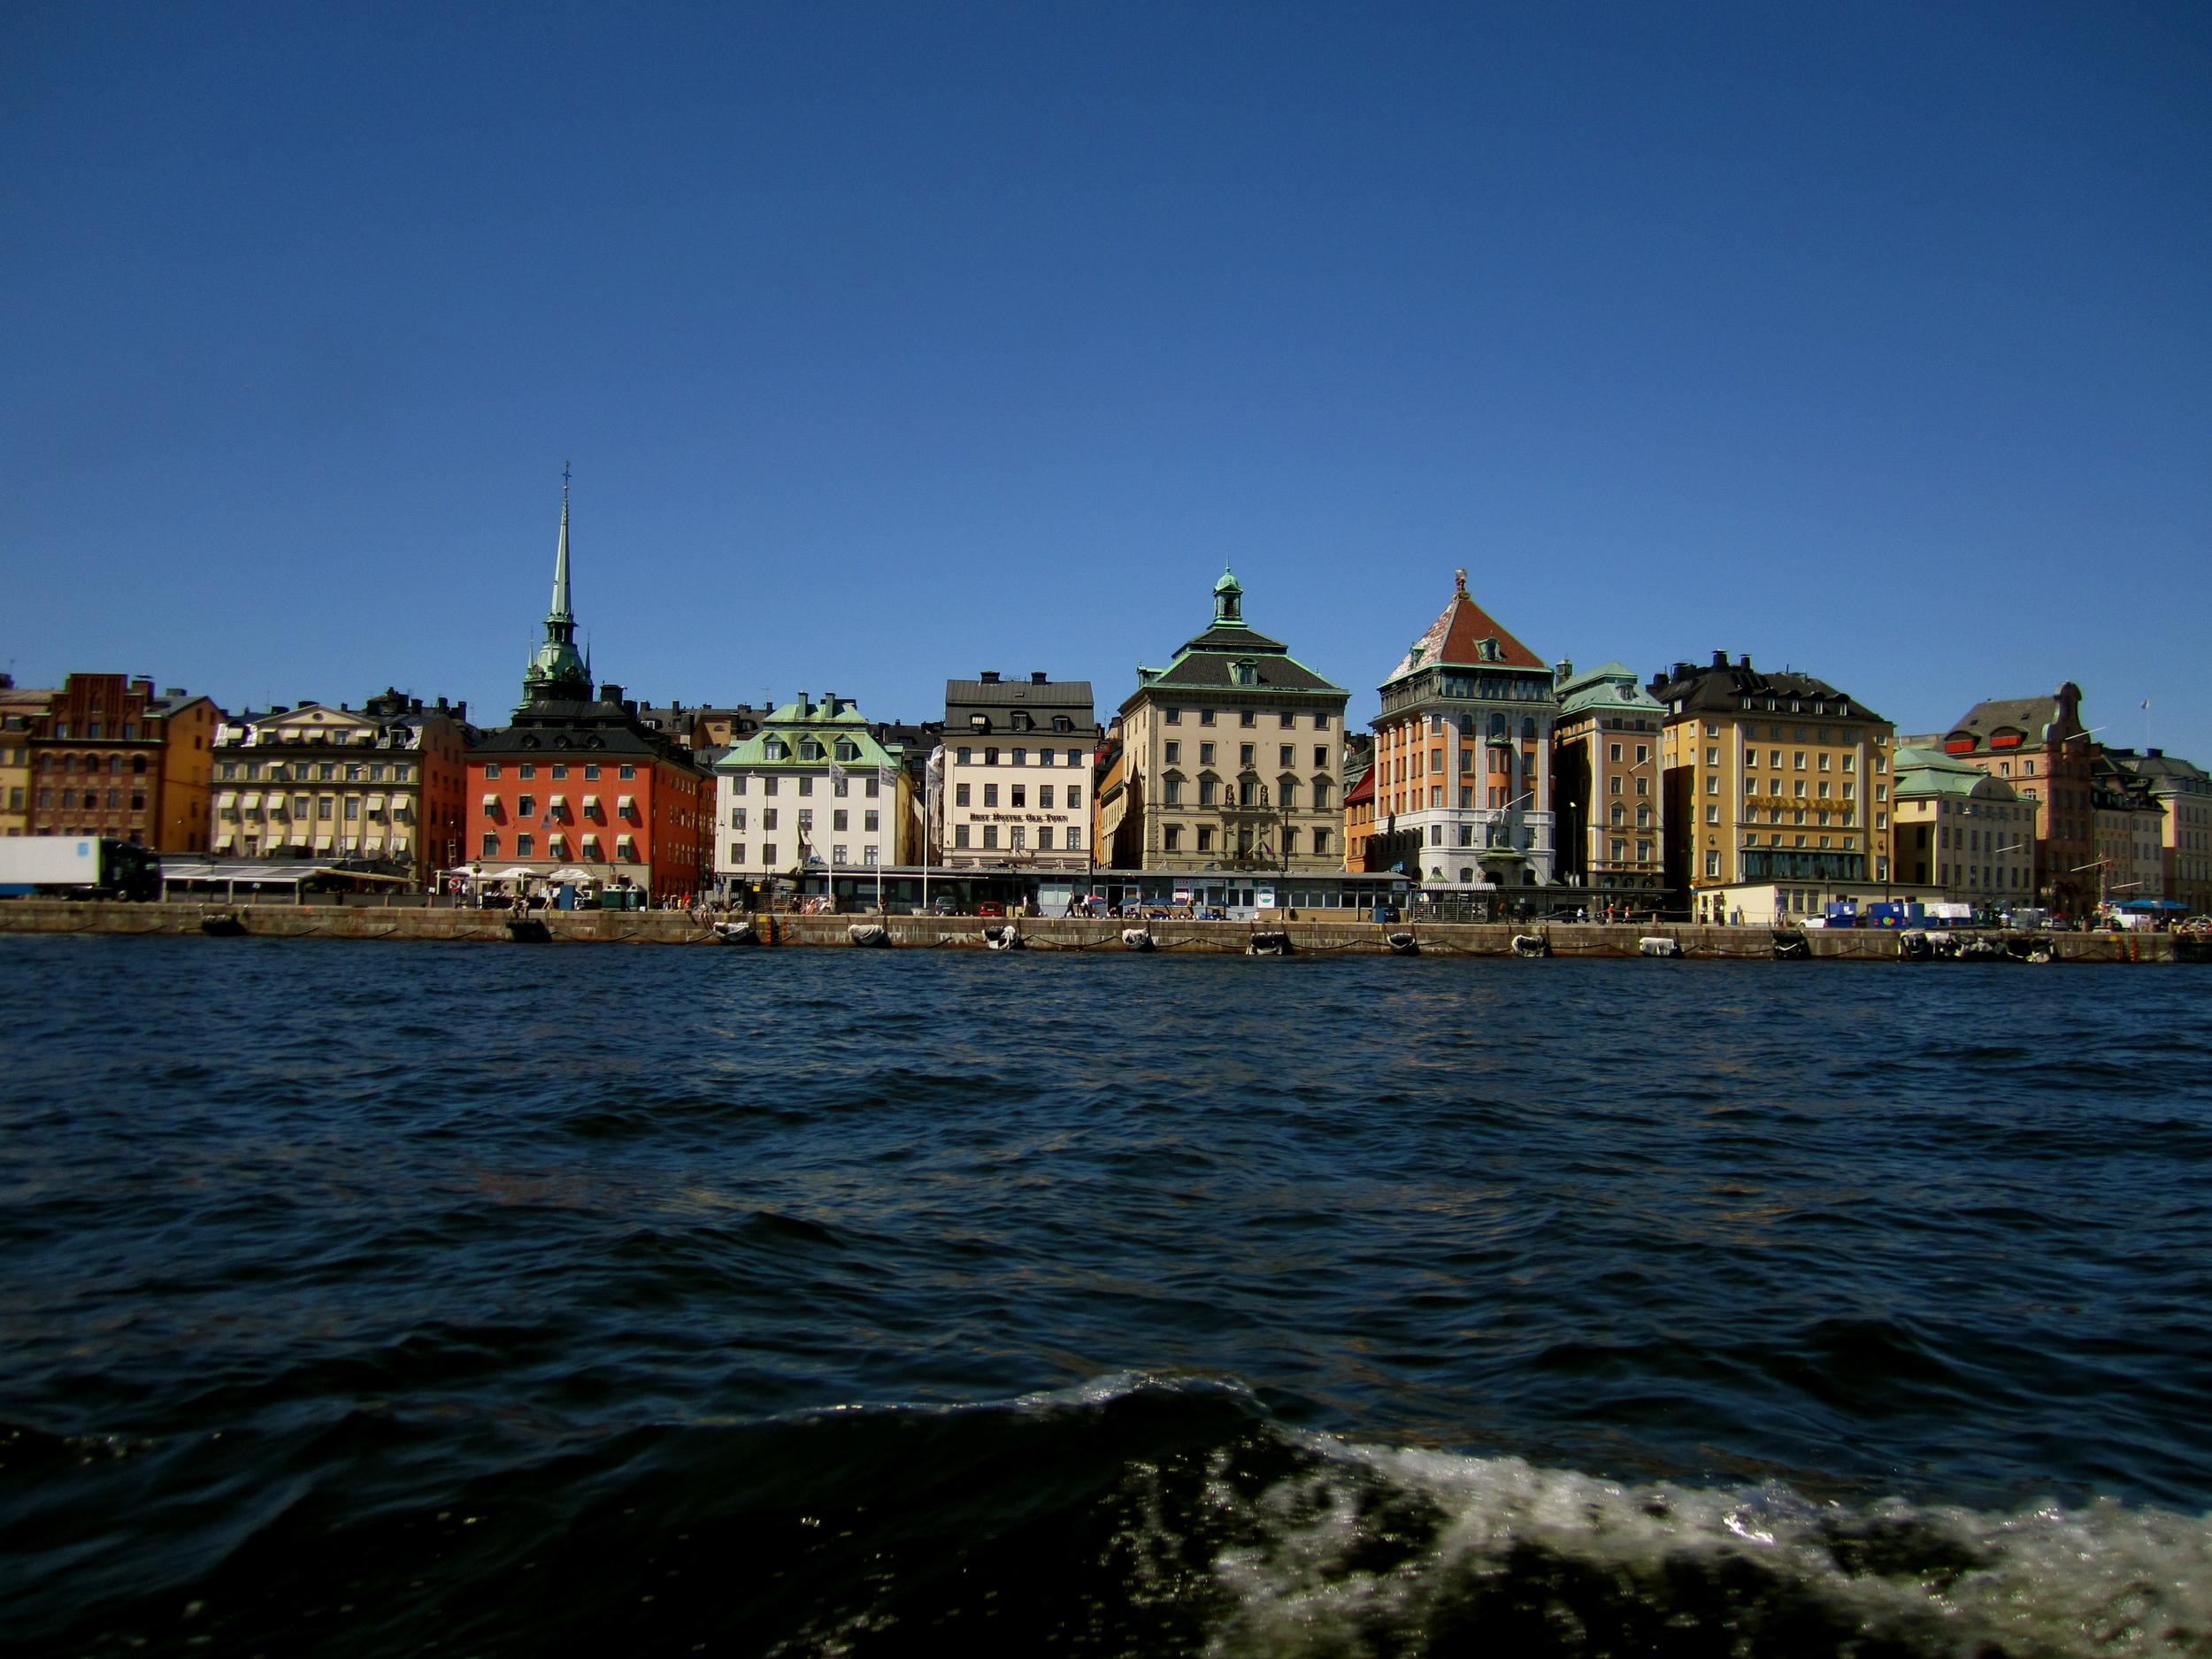 Discover Northern Europe & Scandinavia: Sweden, Denmark, Finland, Estonia & Norway